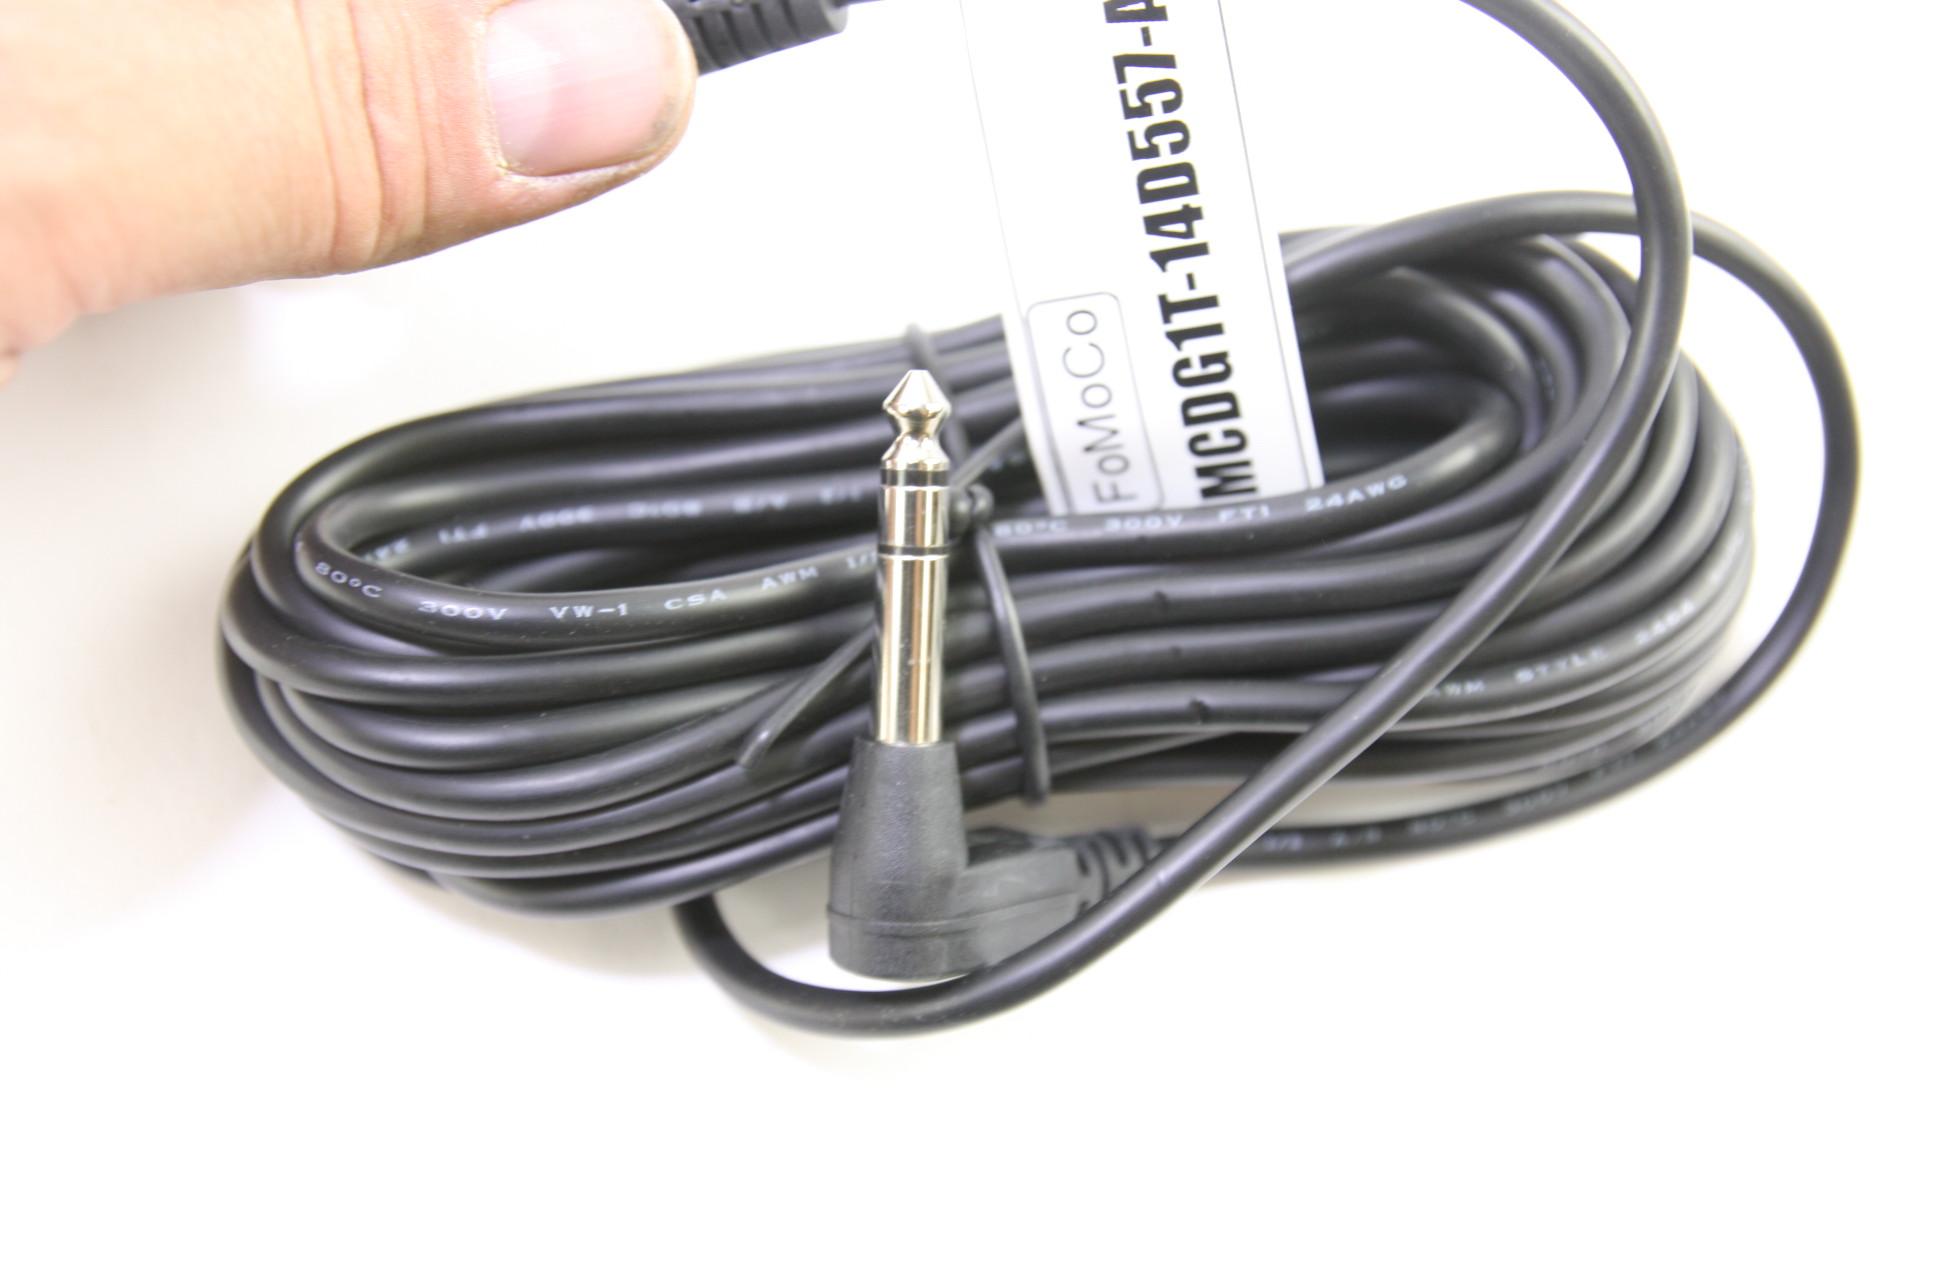 *** New OEM DG1Z19A391B Ford Engine Control Module ECM PCU PCM Wiring Harness - image 4